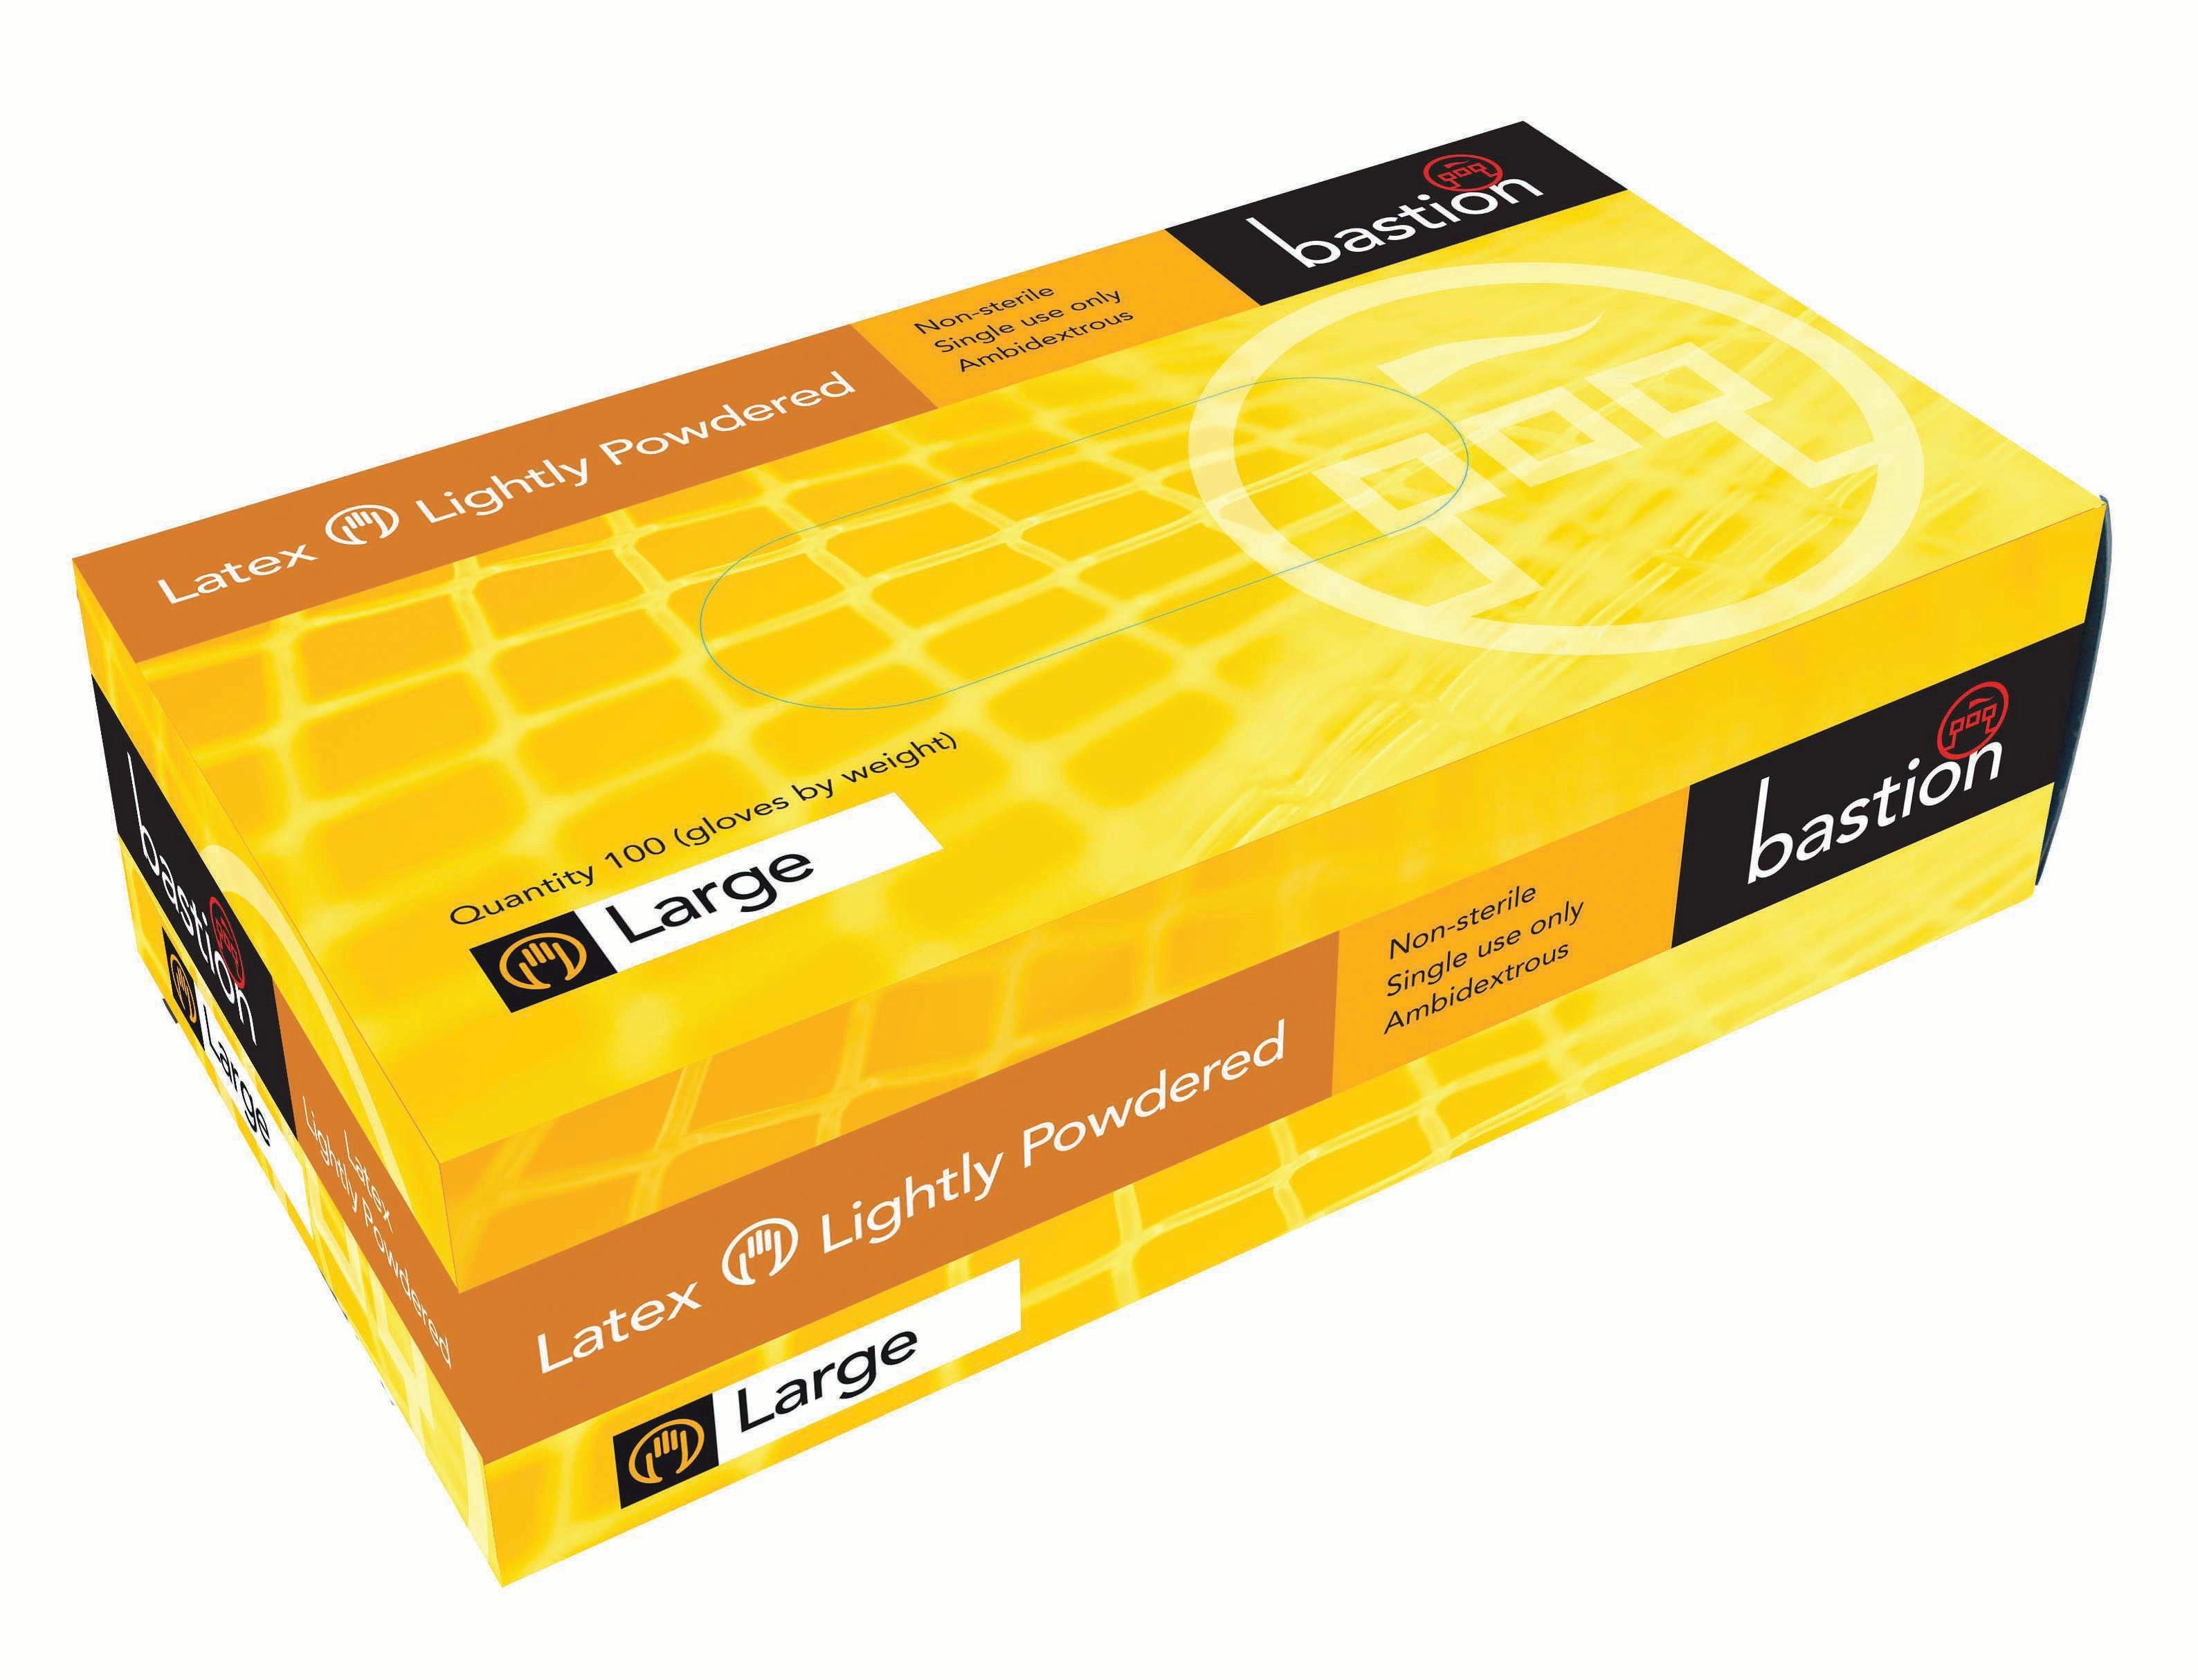 8003_bastion-latex